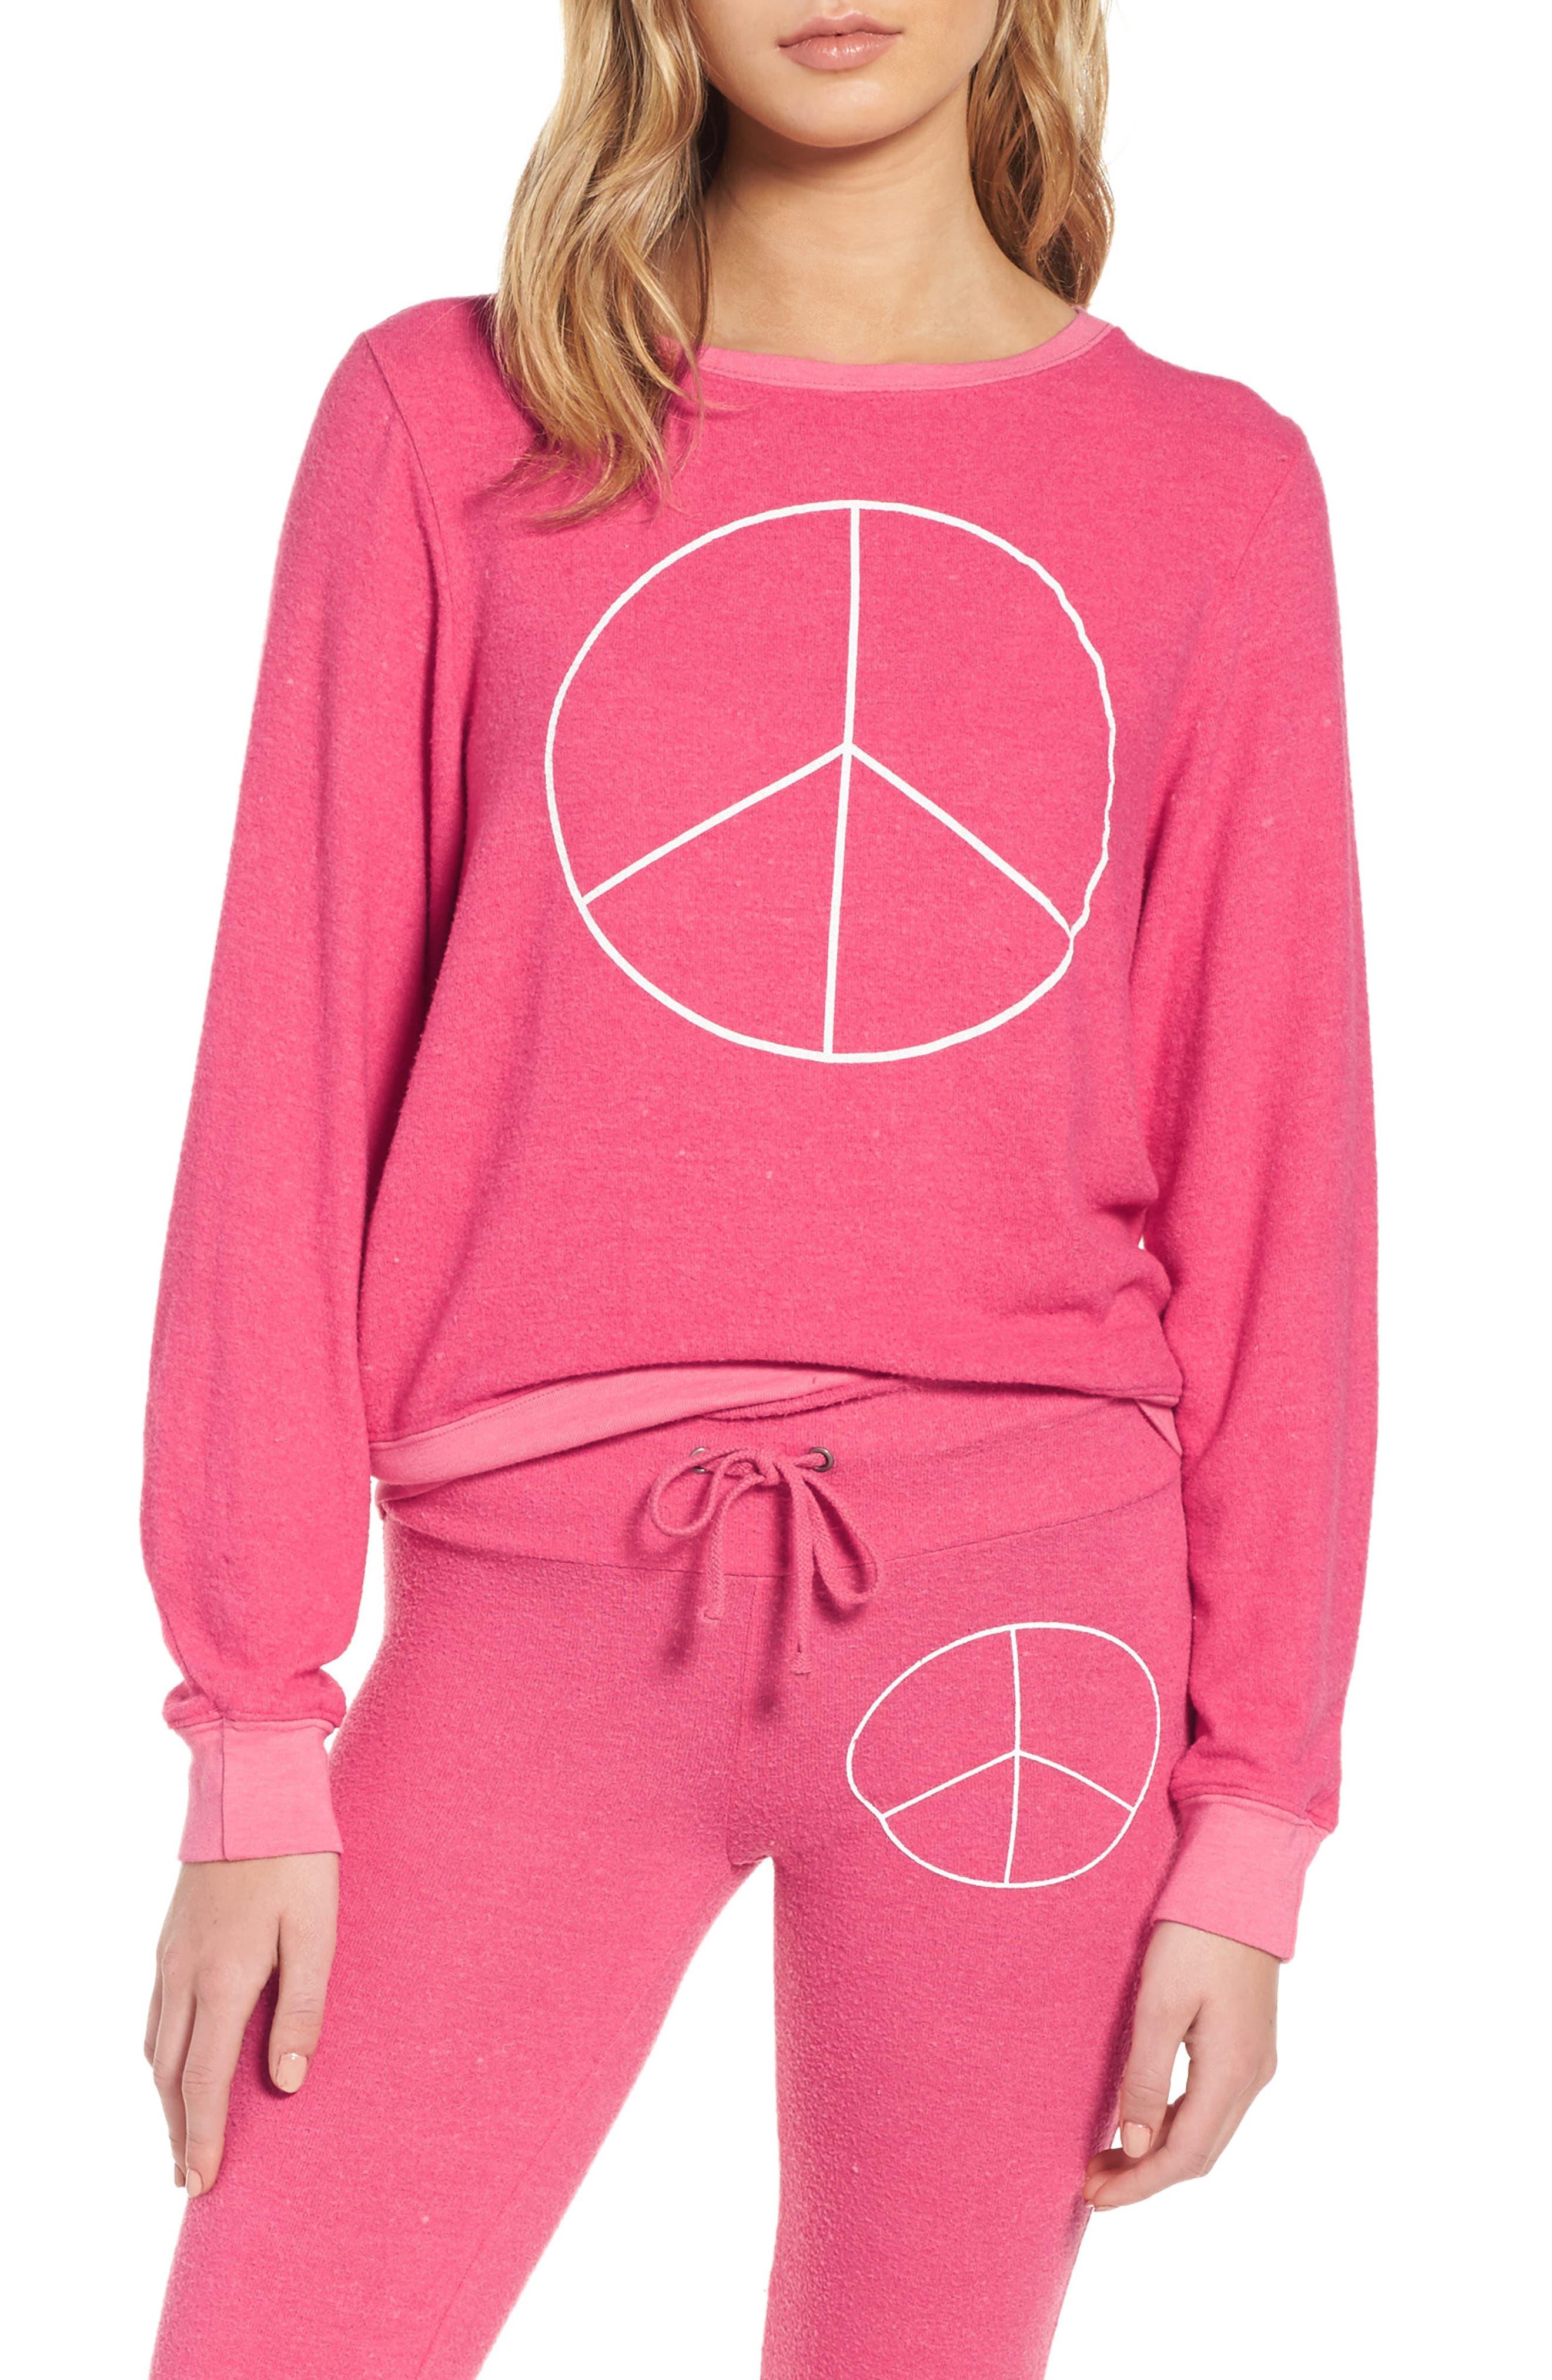 Peace Sweatshirt,                         Main,                         color, 670